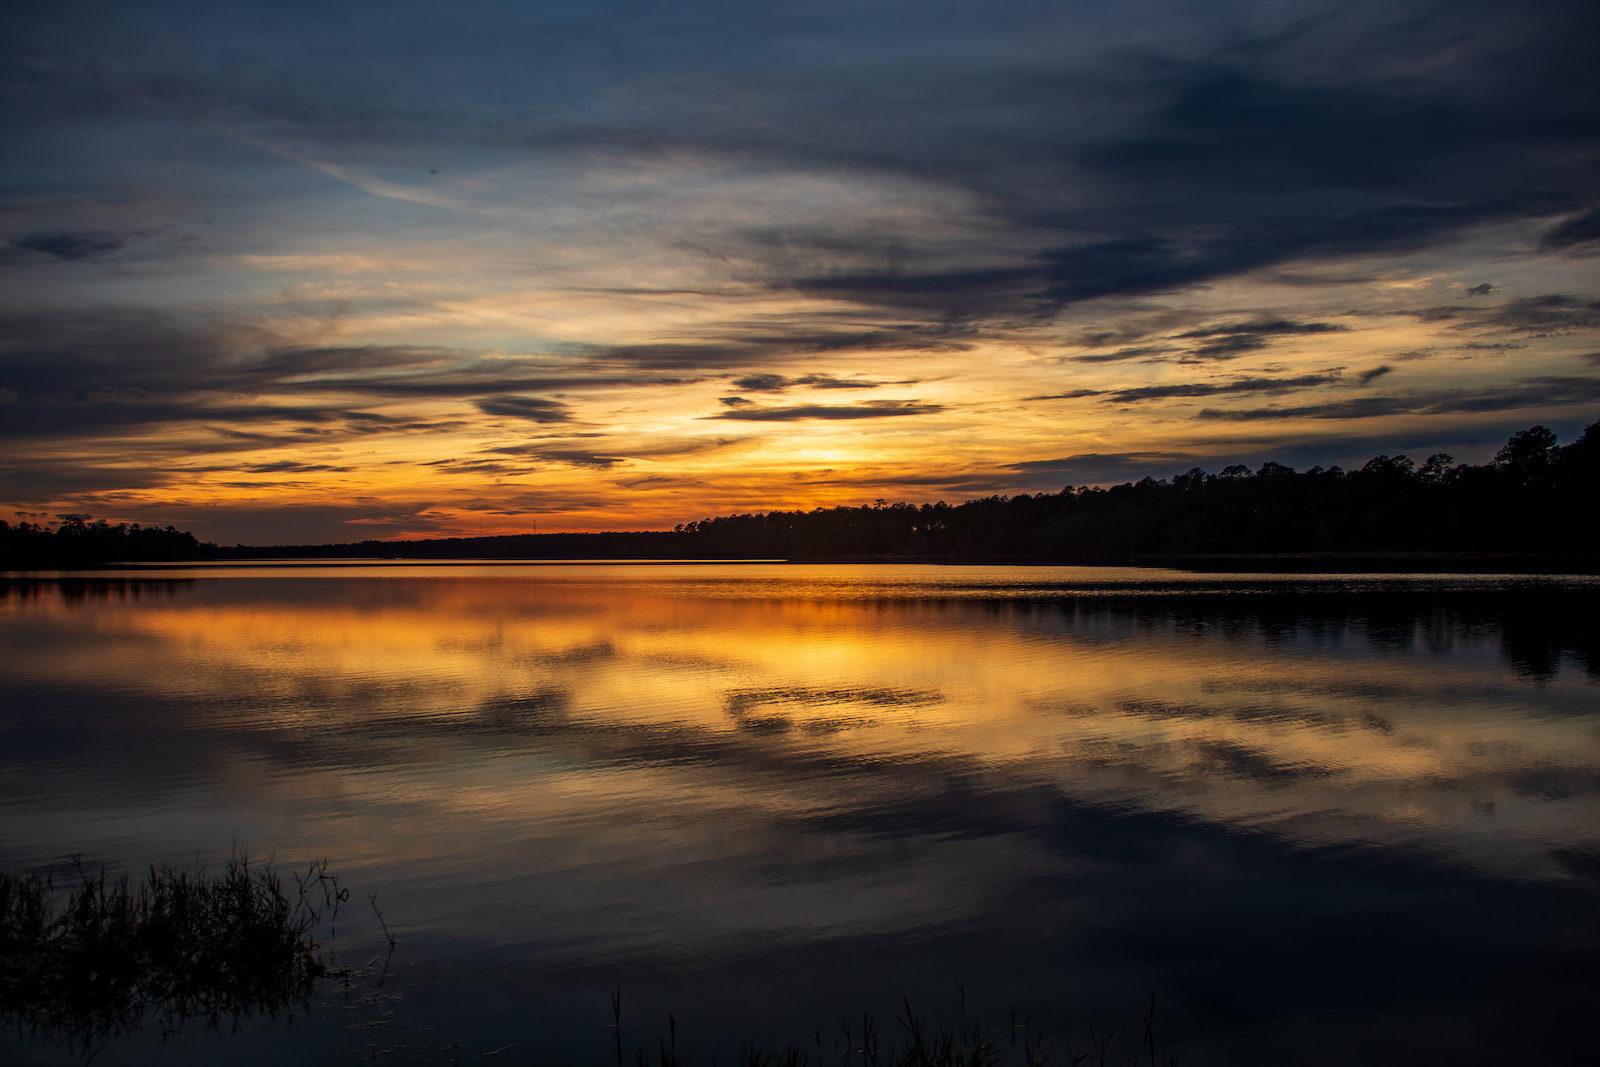 Post sunset at Big Creek Lake